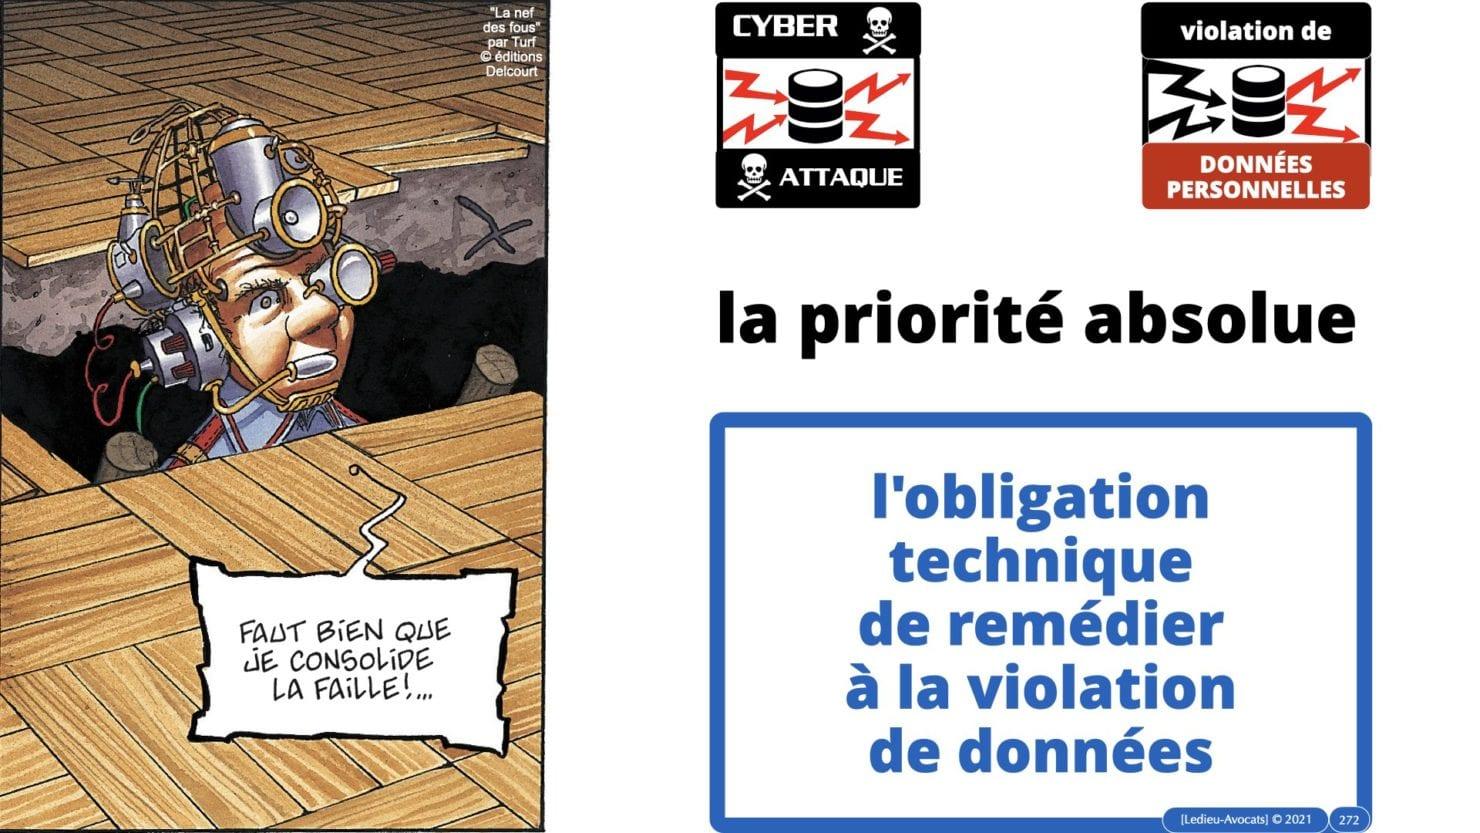 RGPD e-Privacy principes actualité jurisprudence ©Ledieu-Avocats 25-06-2021.272